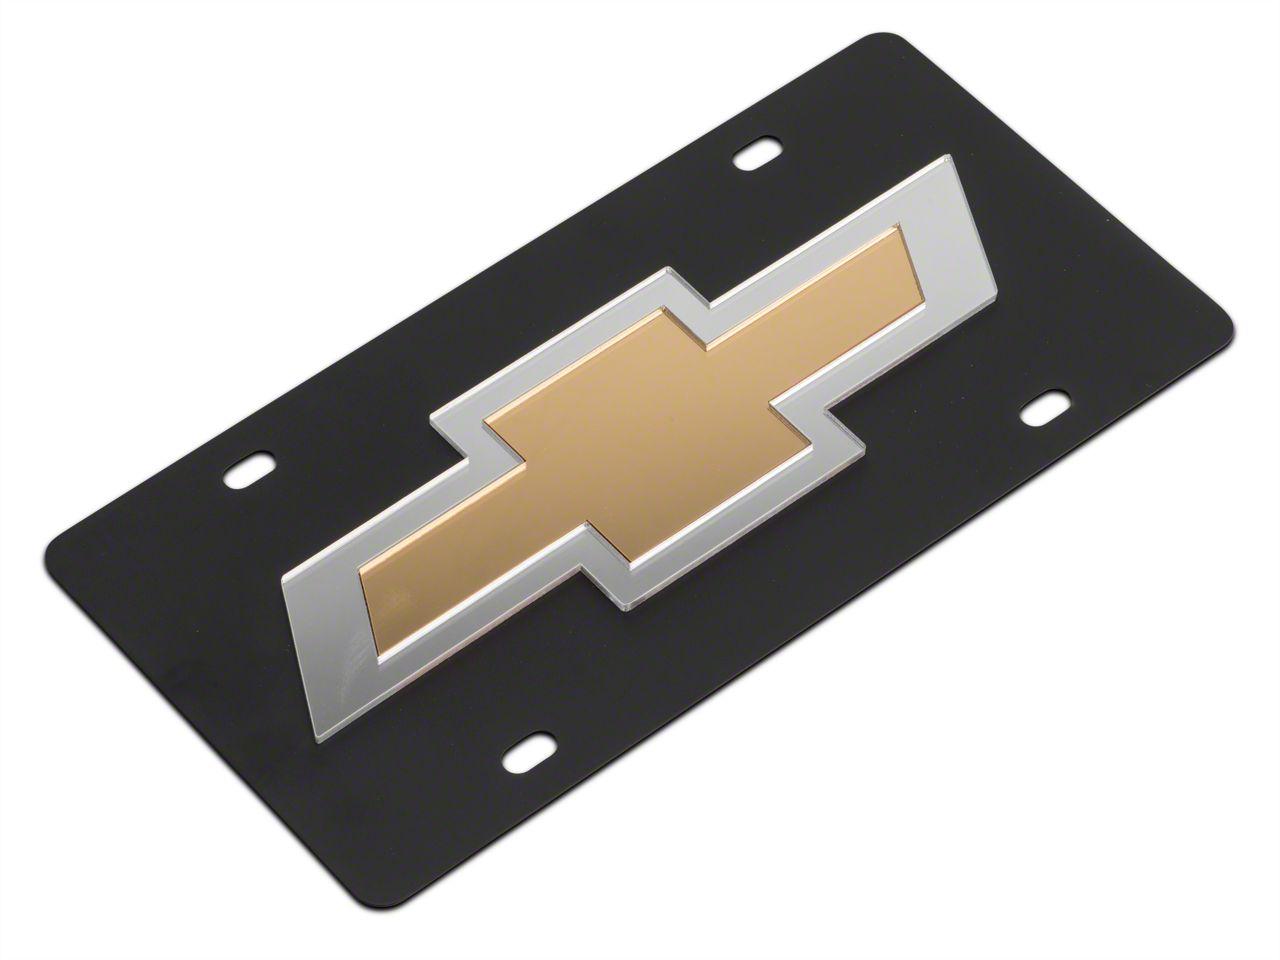 SpeedForm Carbon Steel License Plate w/ Gold Bowtie Logo (99-18 Silverado 1500)